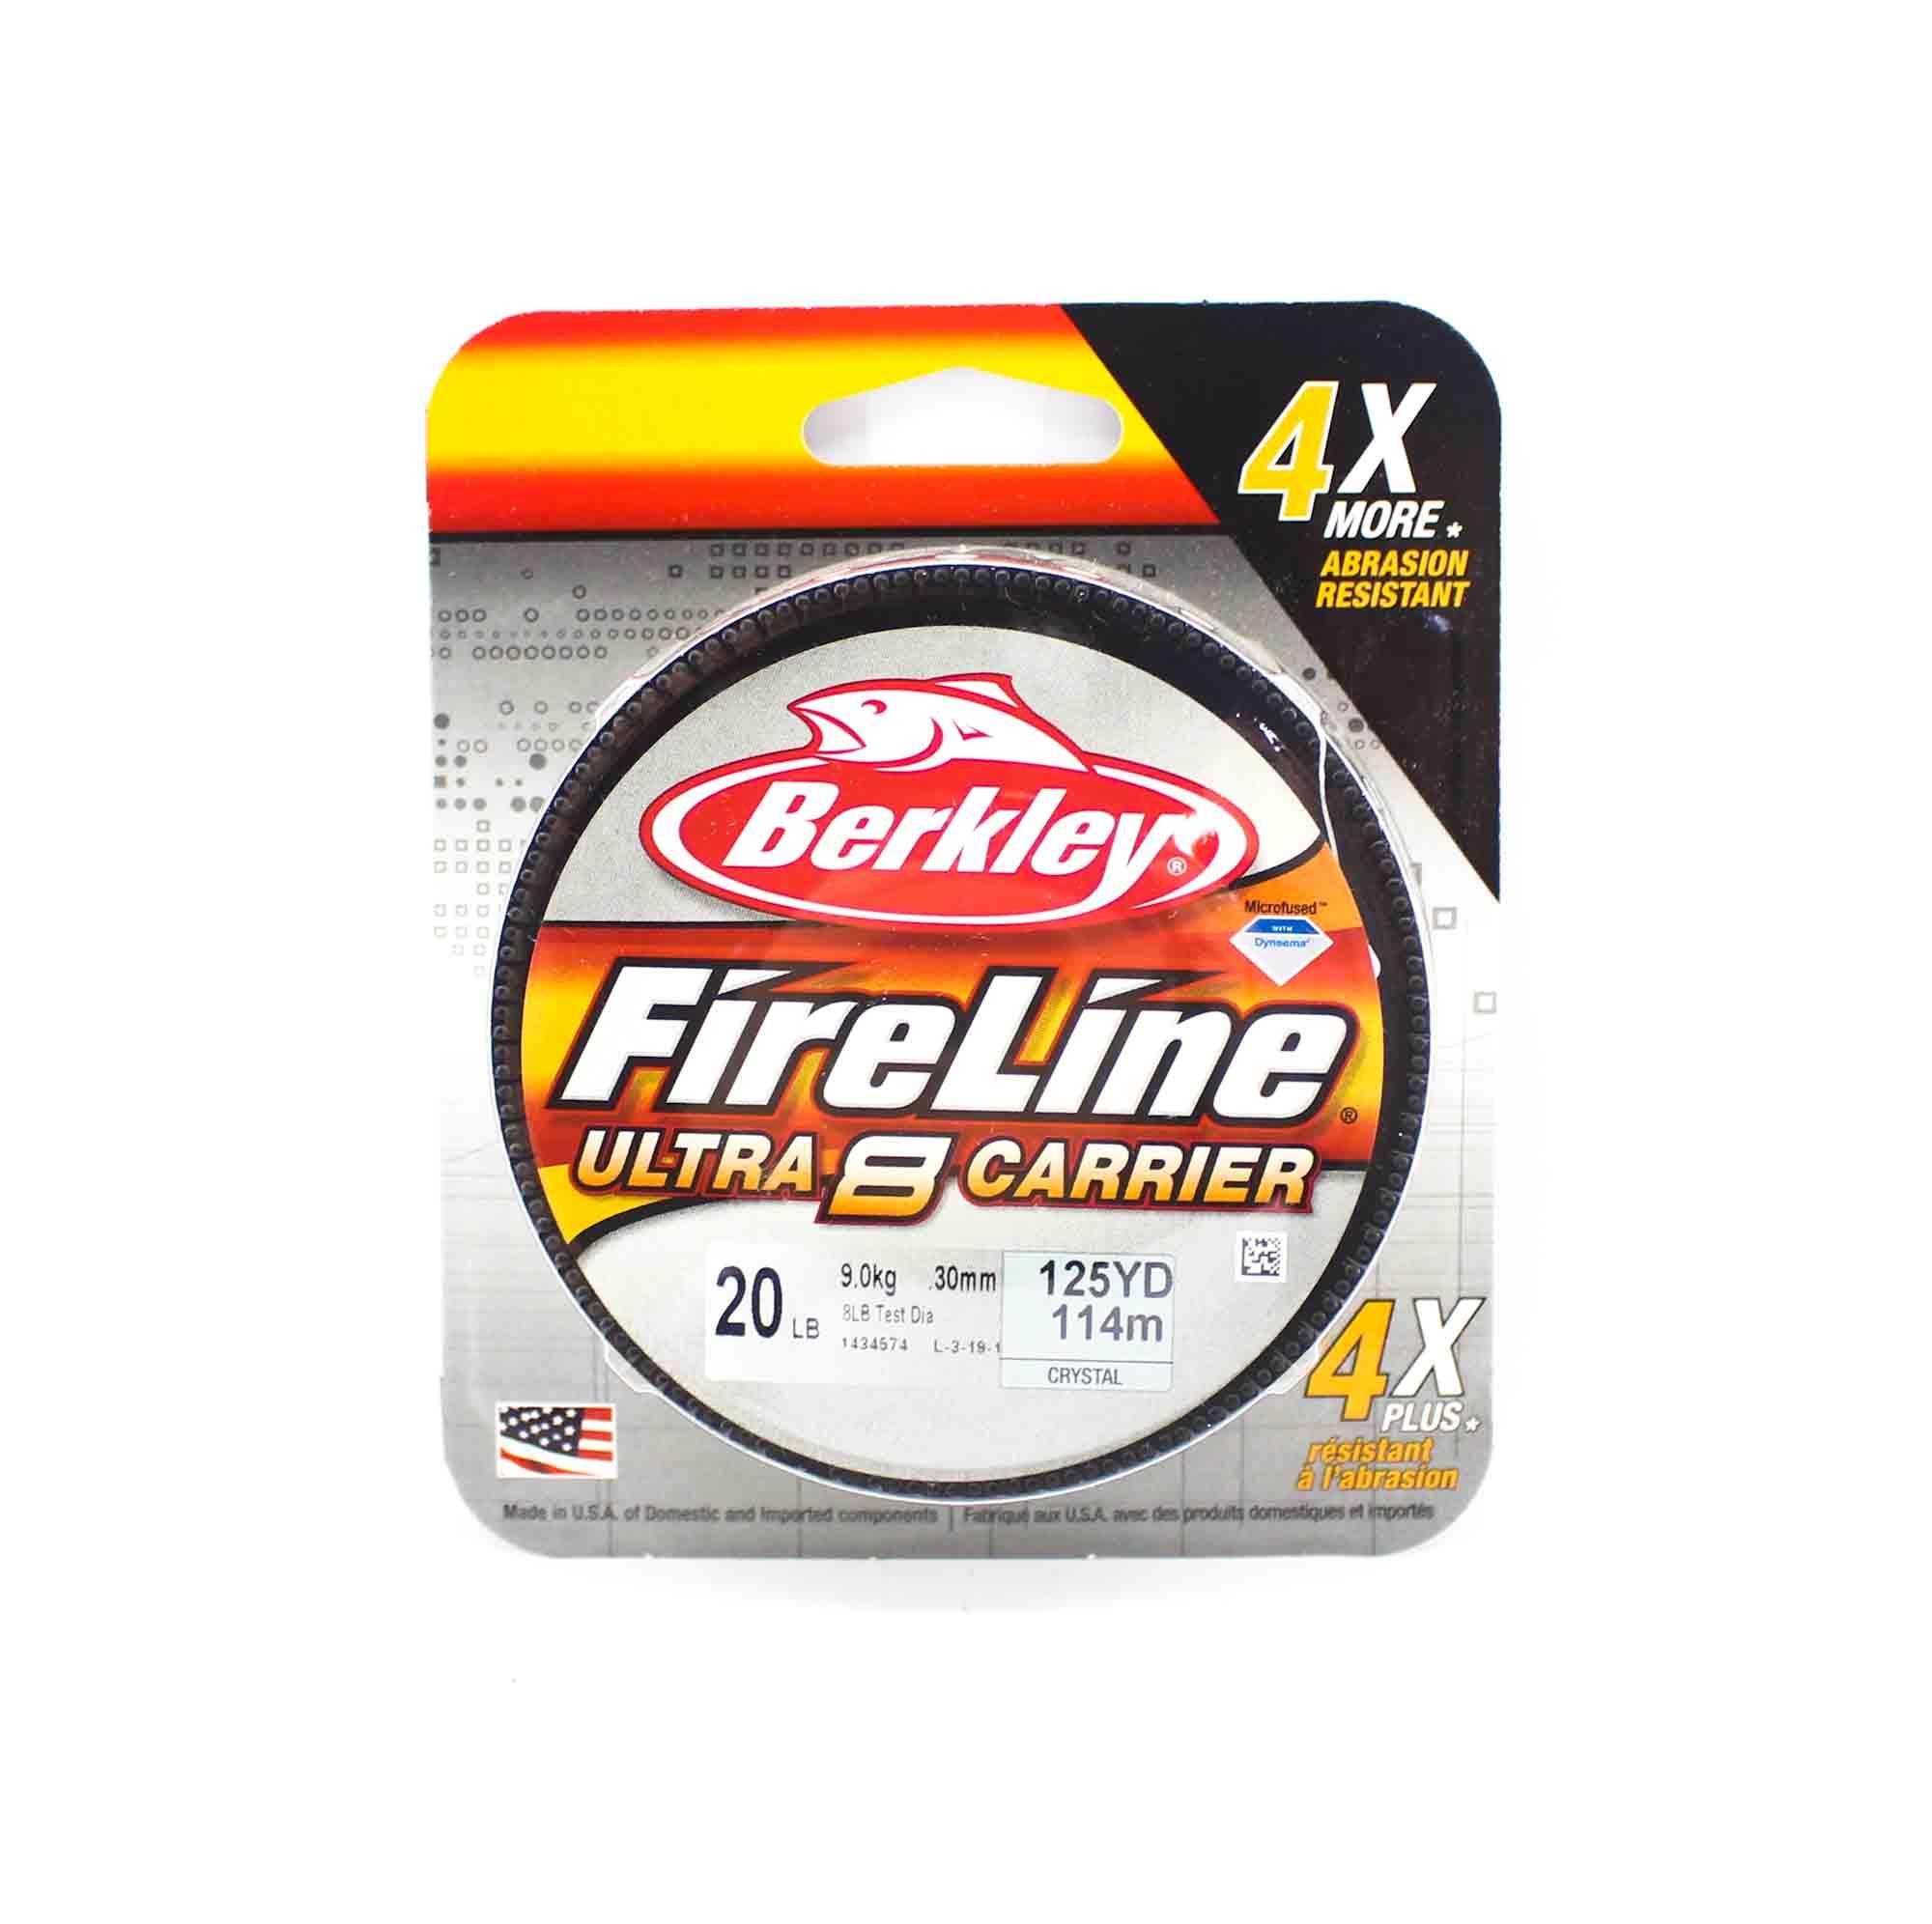 Berkley Fireline Ultra 8 Carrier 125yds 20lb White (4502)